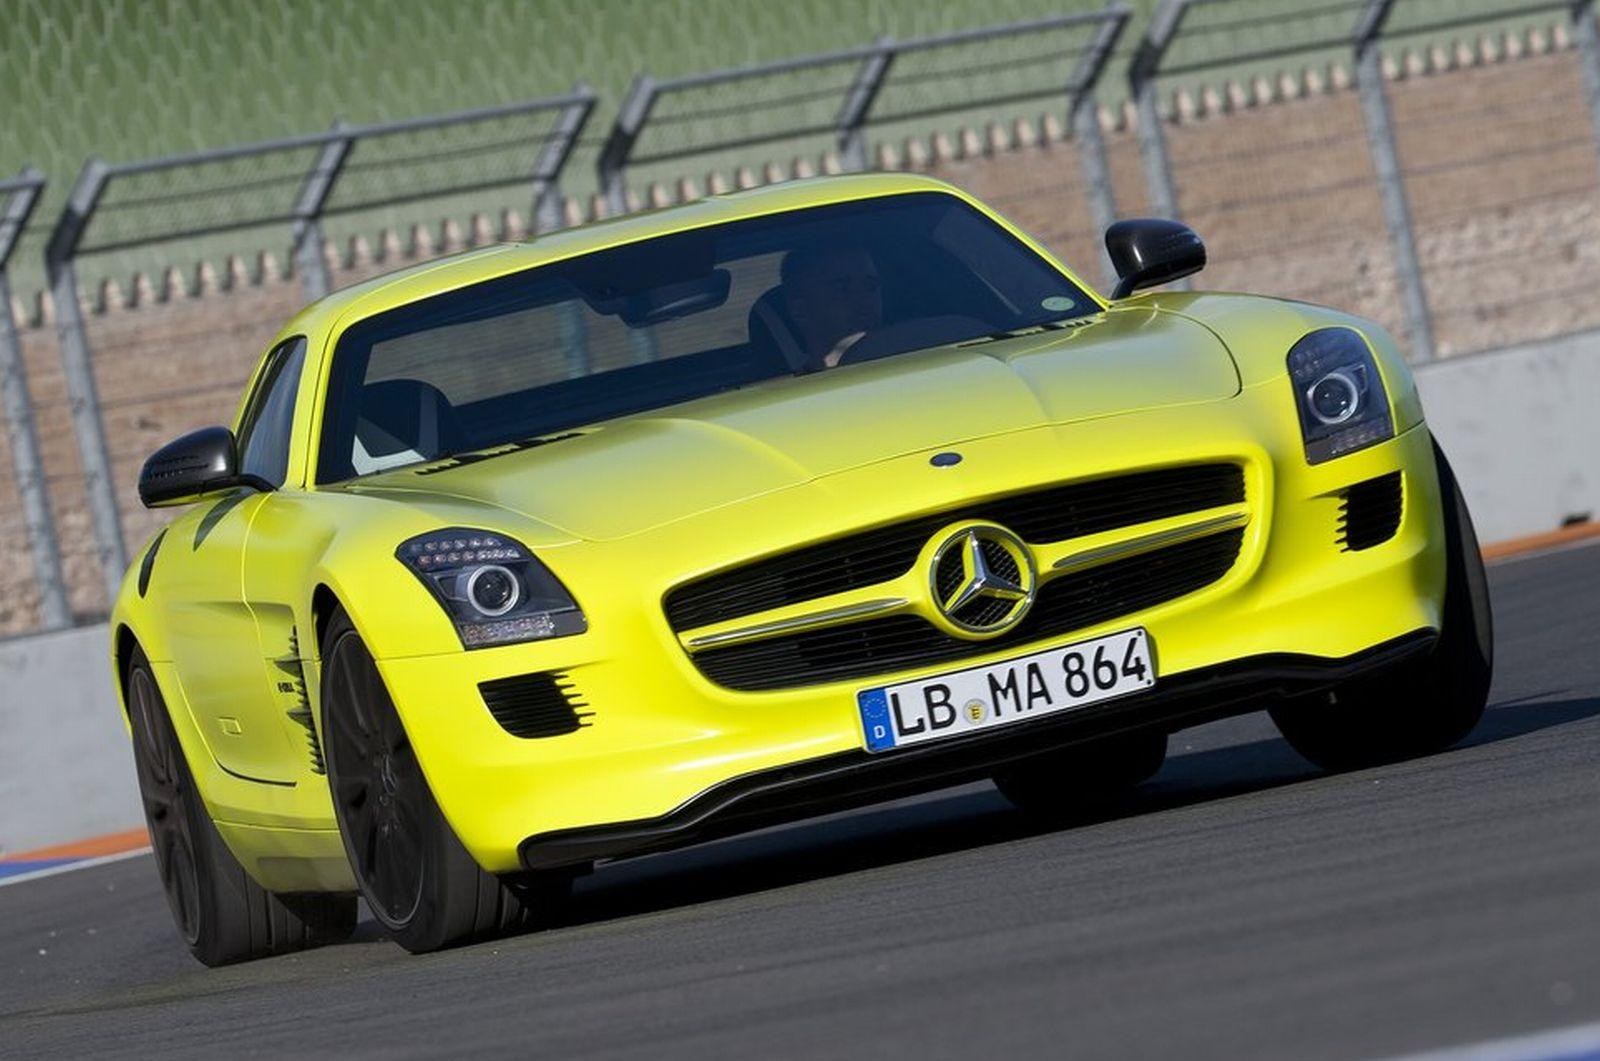 Sport car garage mercedes benz slc amg 2015 for Sport car mercedes benz